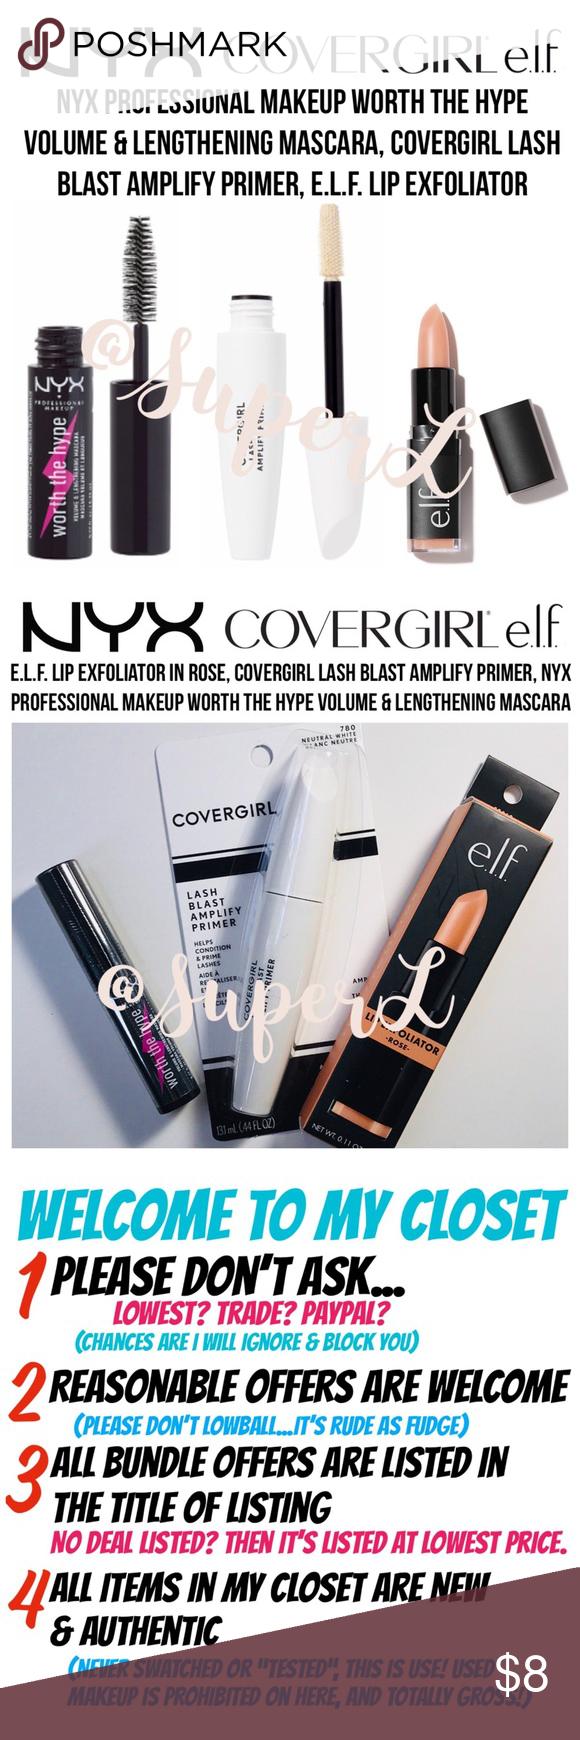 3 15 Nyx Mascara Elf Lip Covergirl Primer Nyx Mascara Covergirl Primer Covergirl